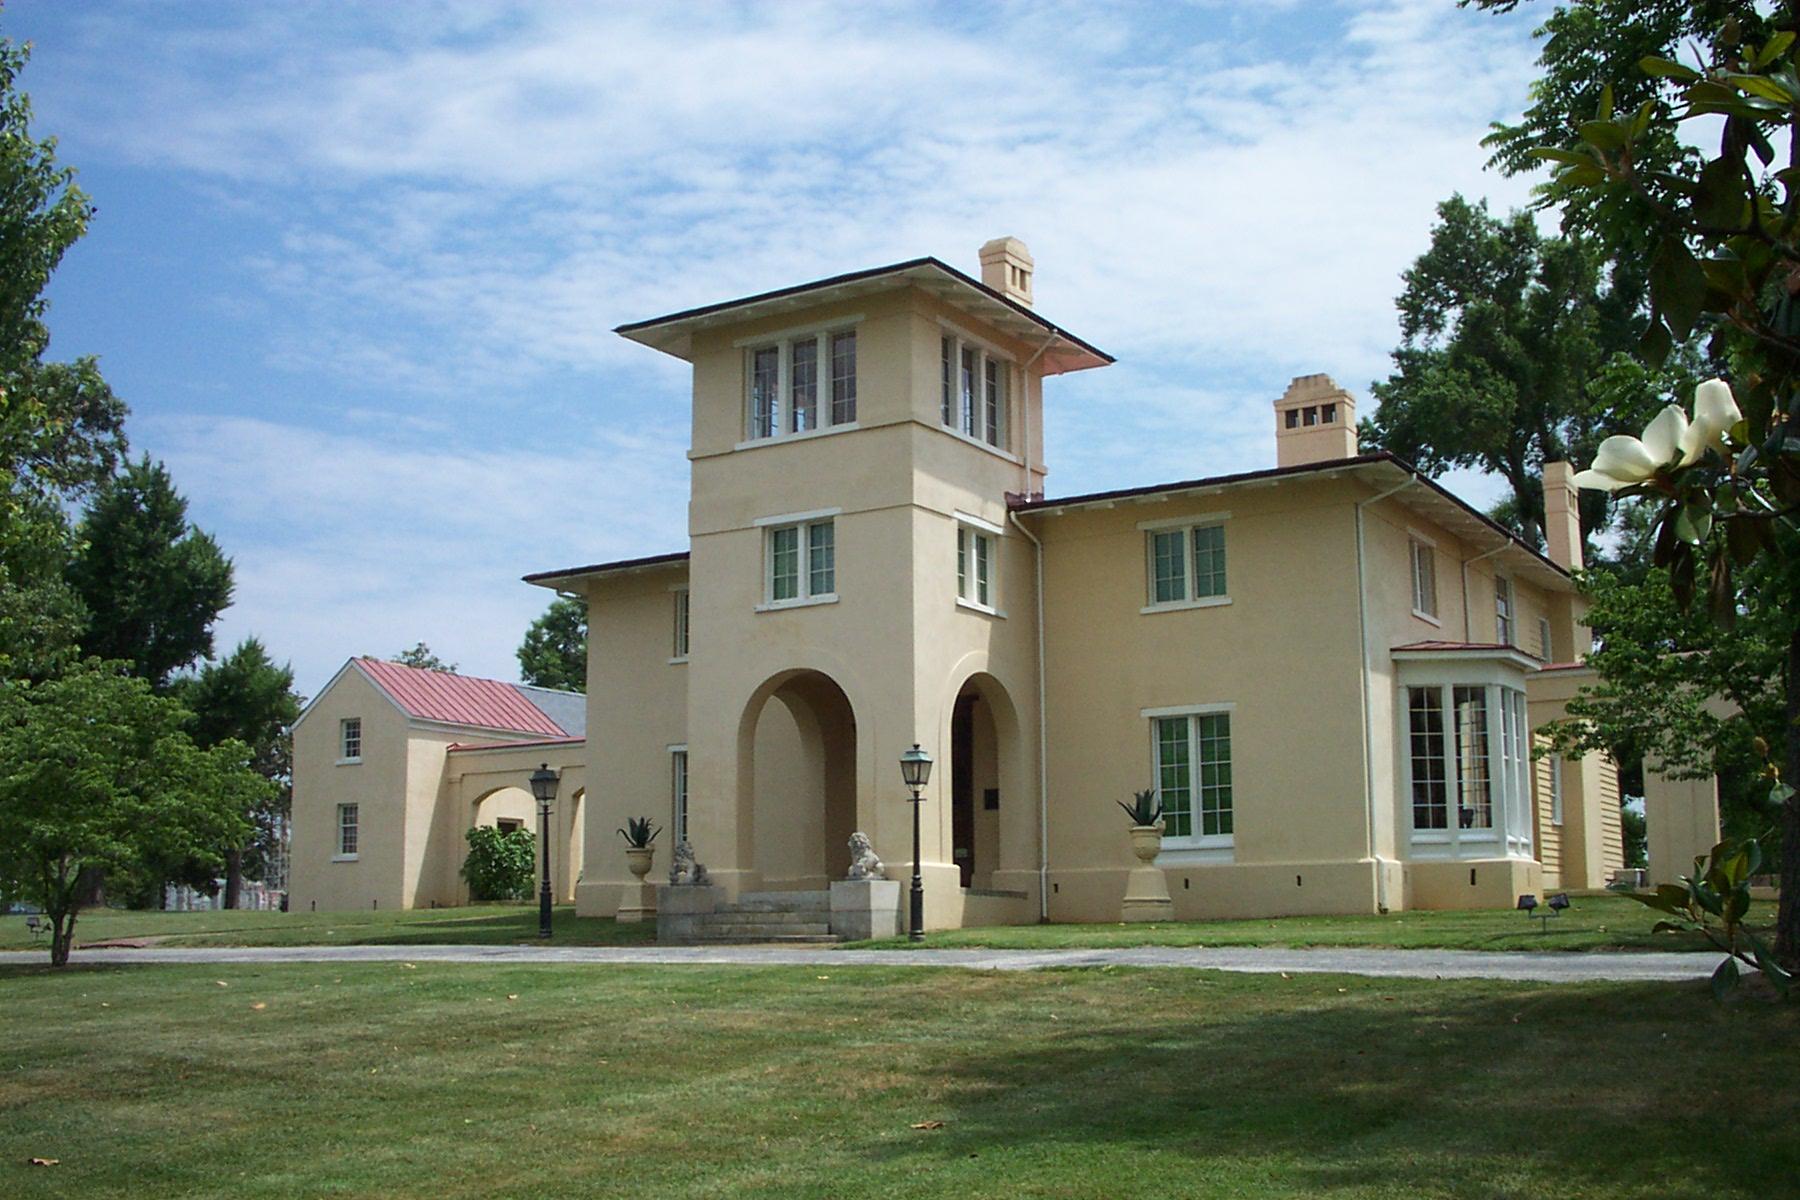 greensboro north carolina familypedia. Black Bedroom Furniture Sets. Home Design Ideas